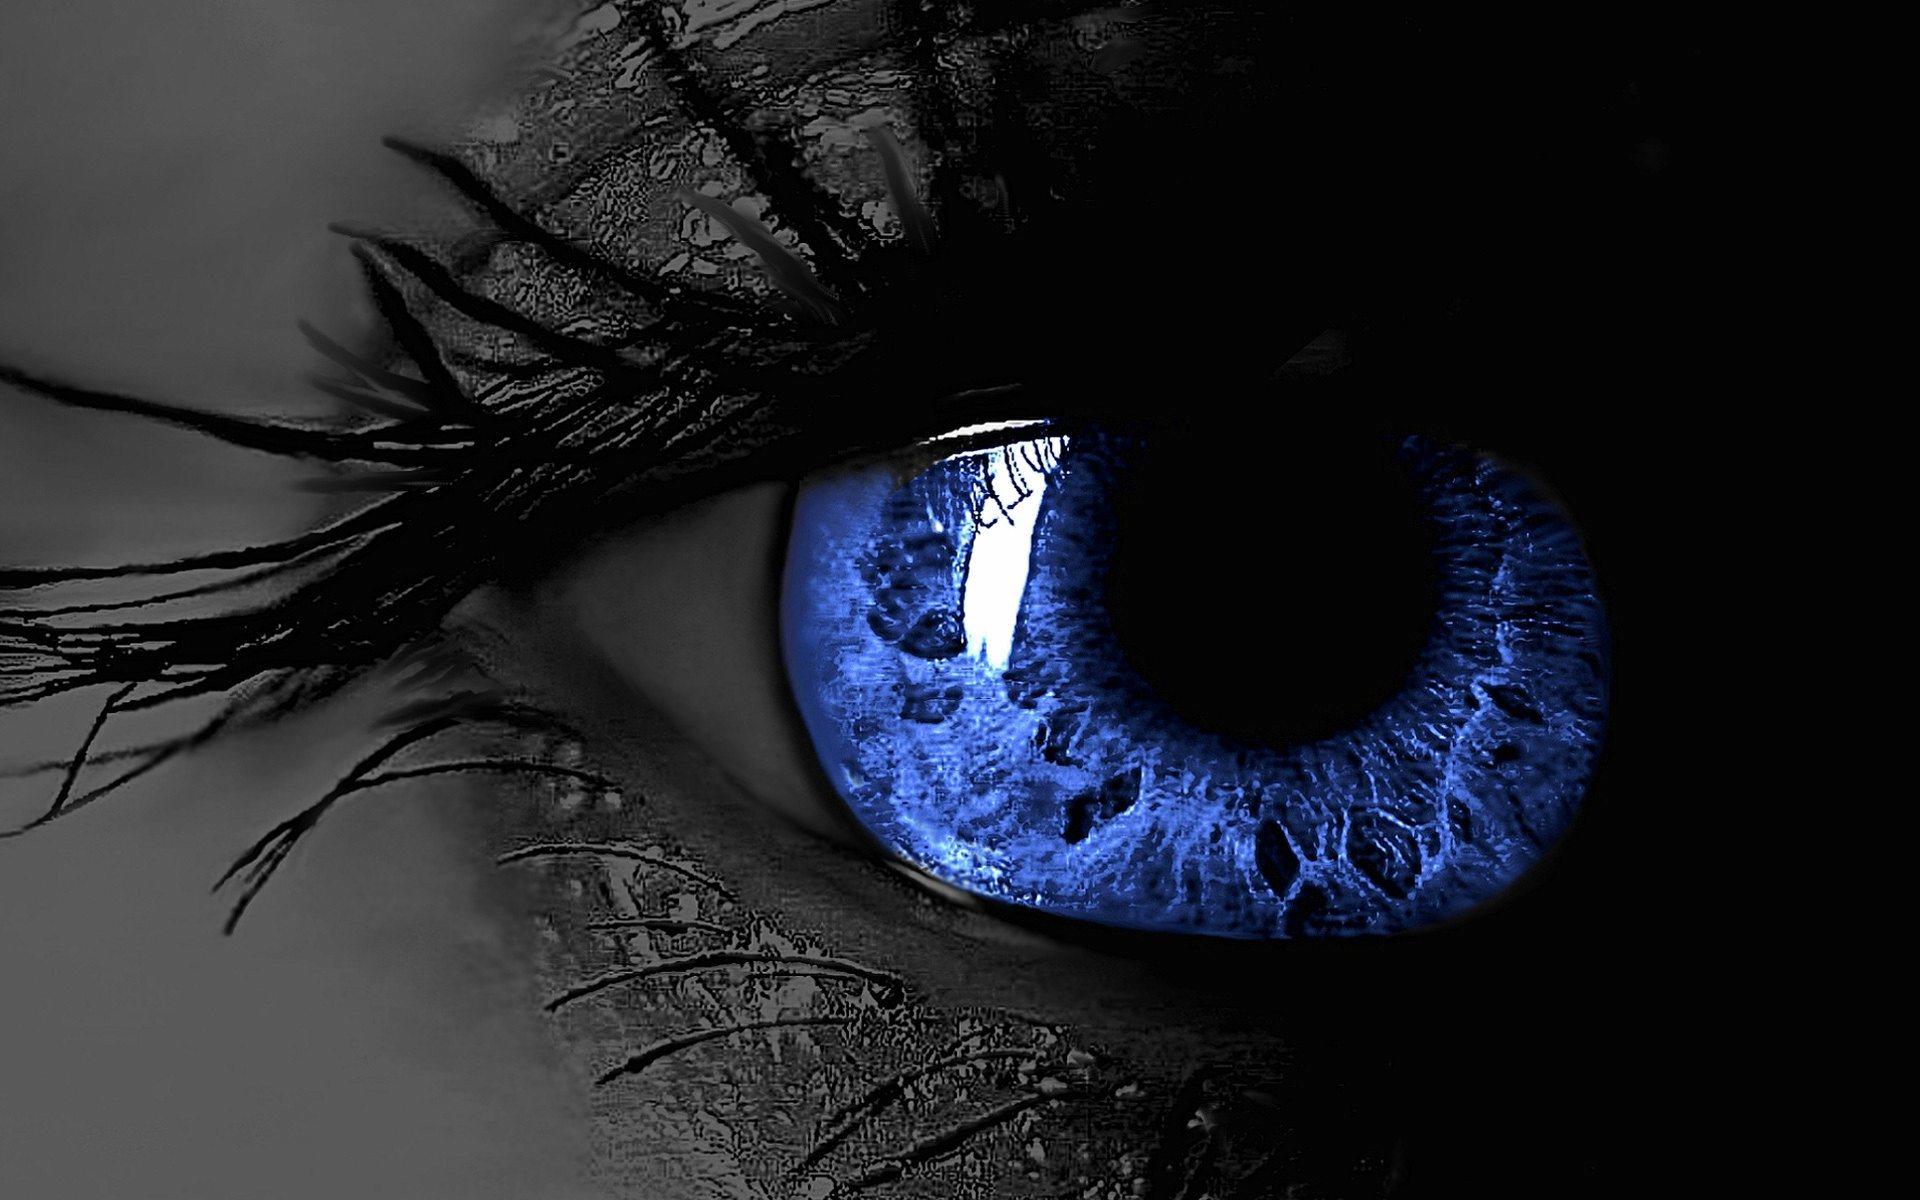 Blue Eye Widescreen HD Wallpaper 1920x1200